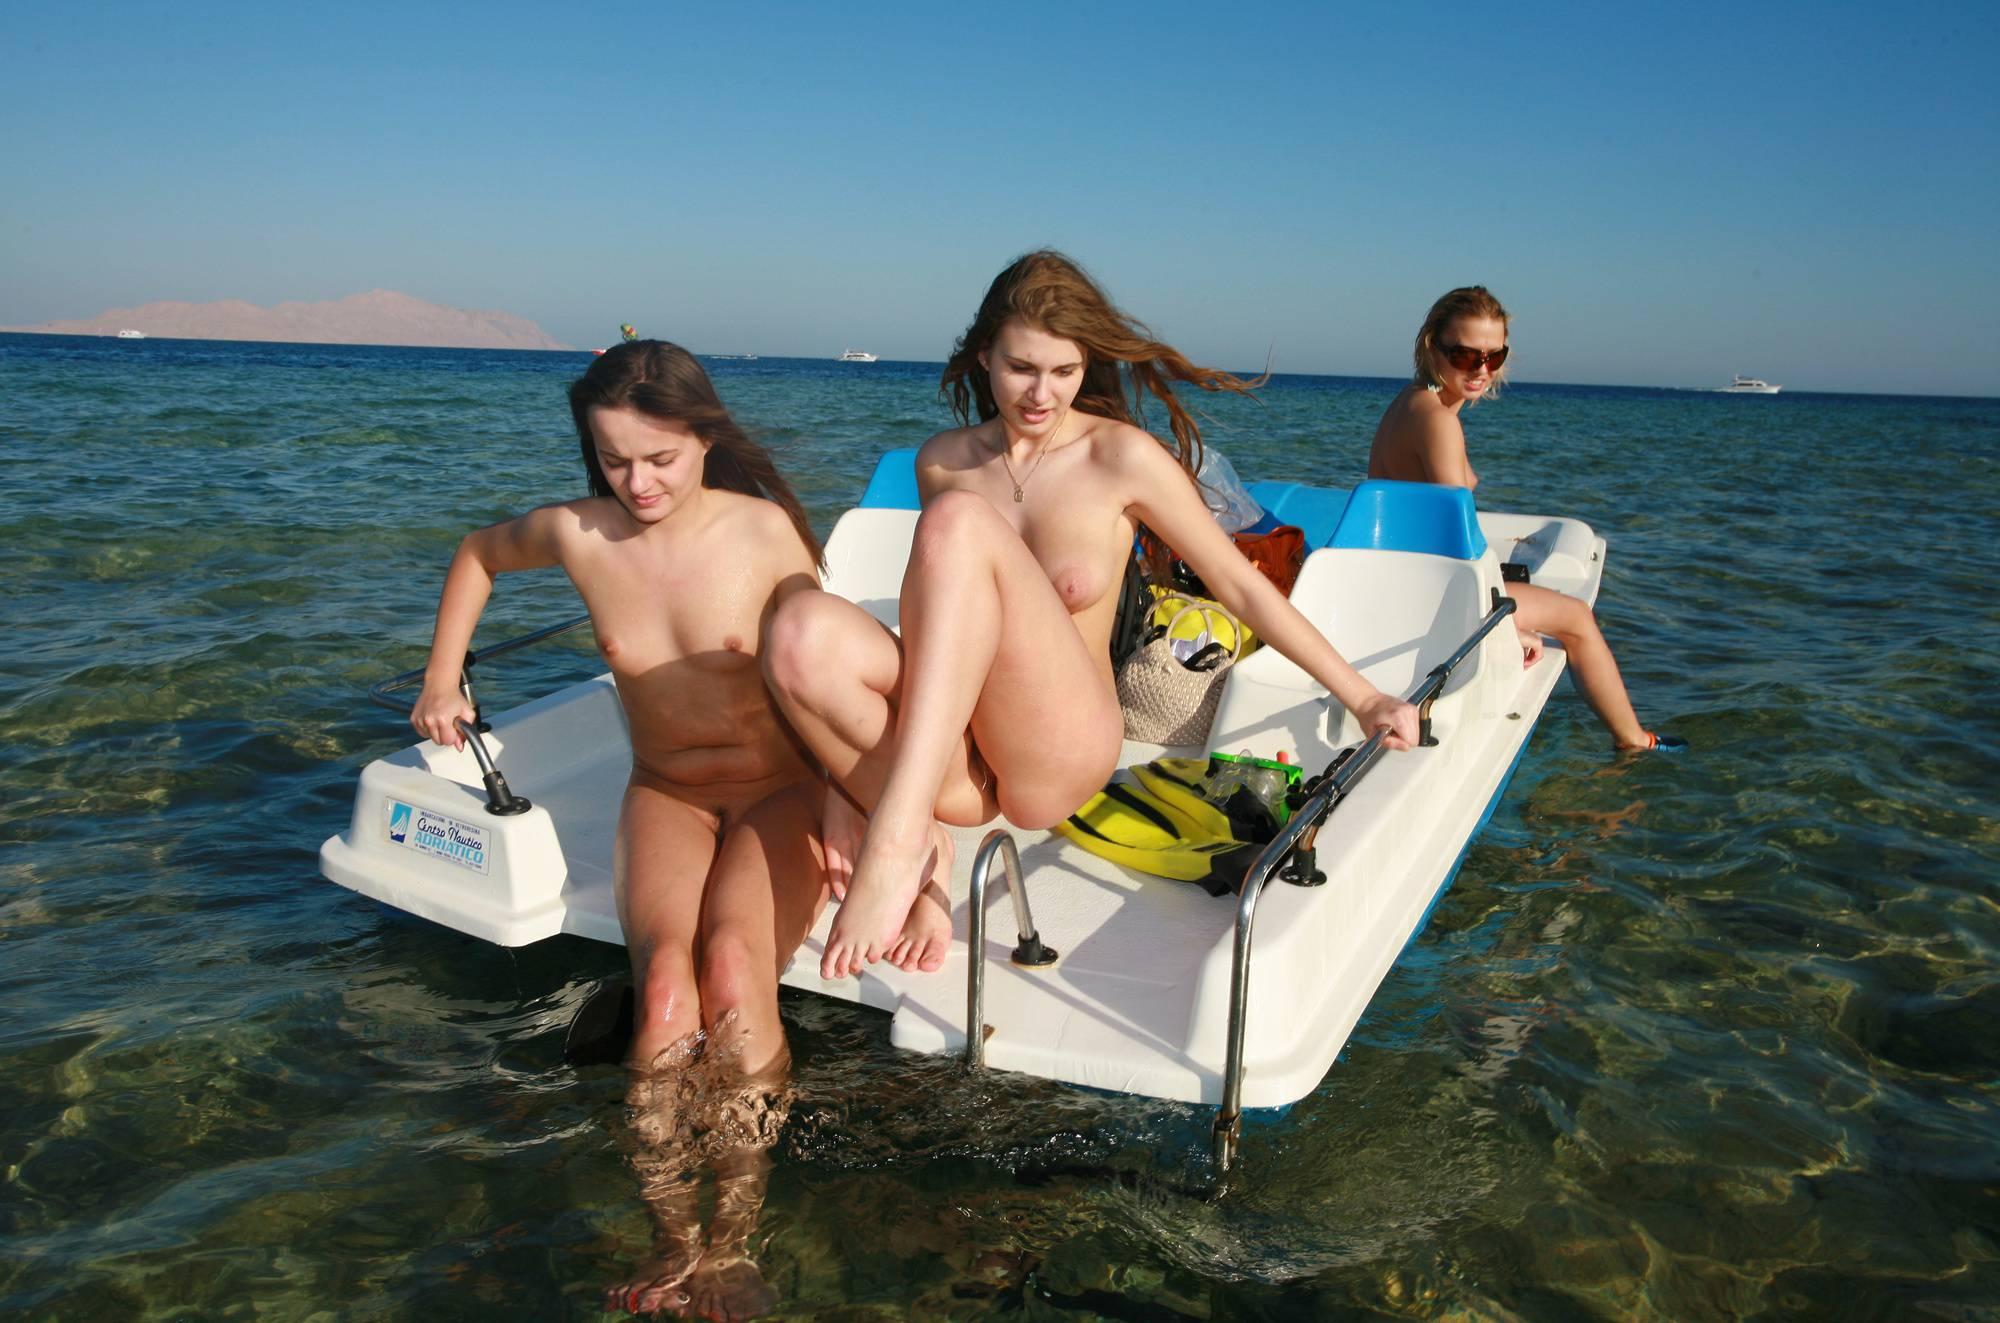 Egyptian Paddle-boat Part - 1